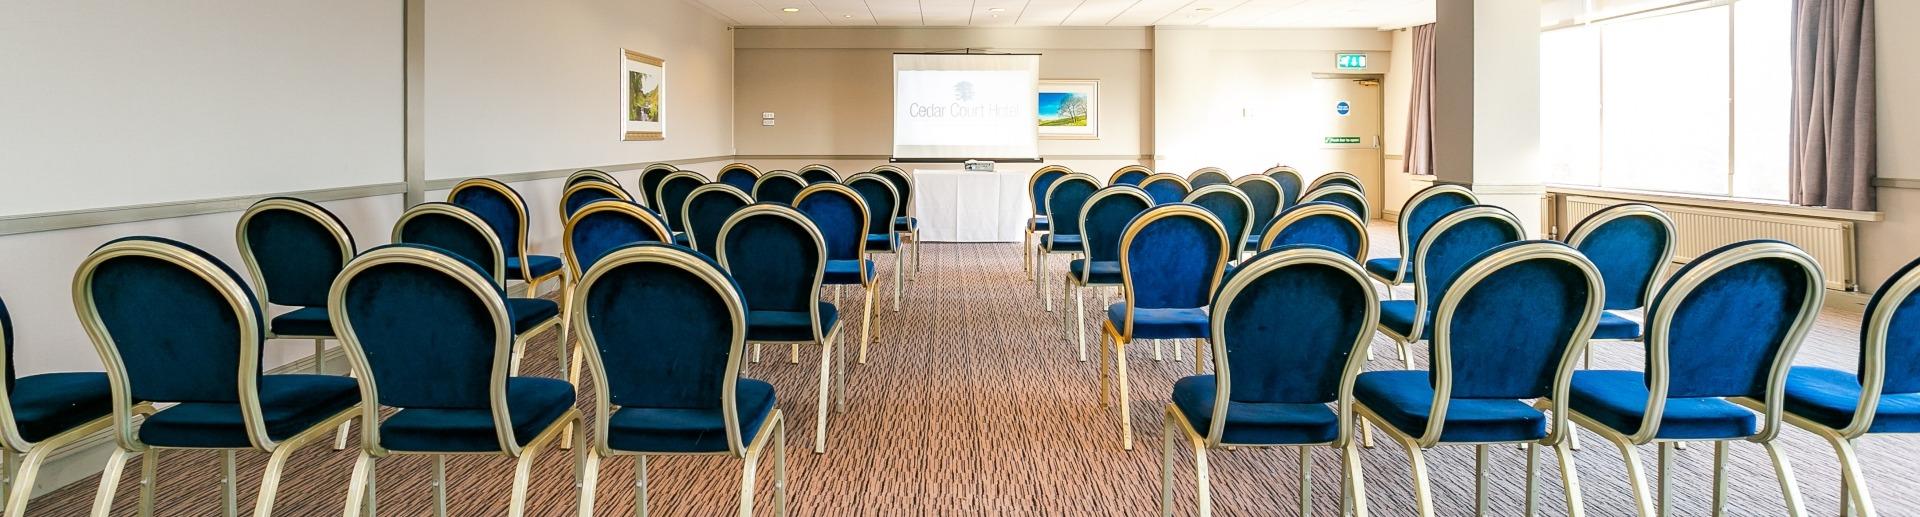 Cedar Court Huddersfield meeting room